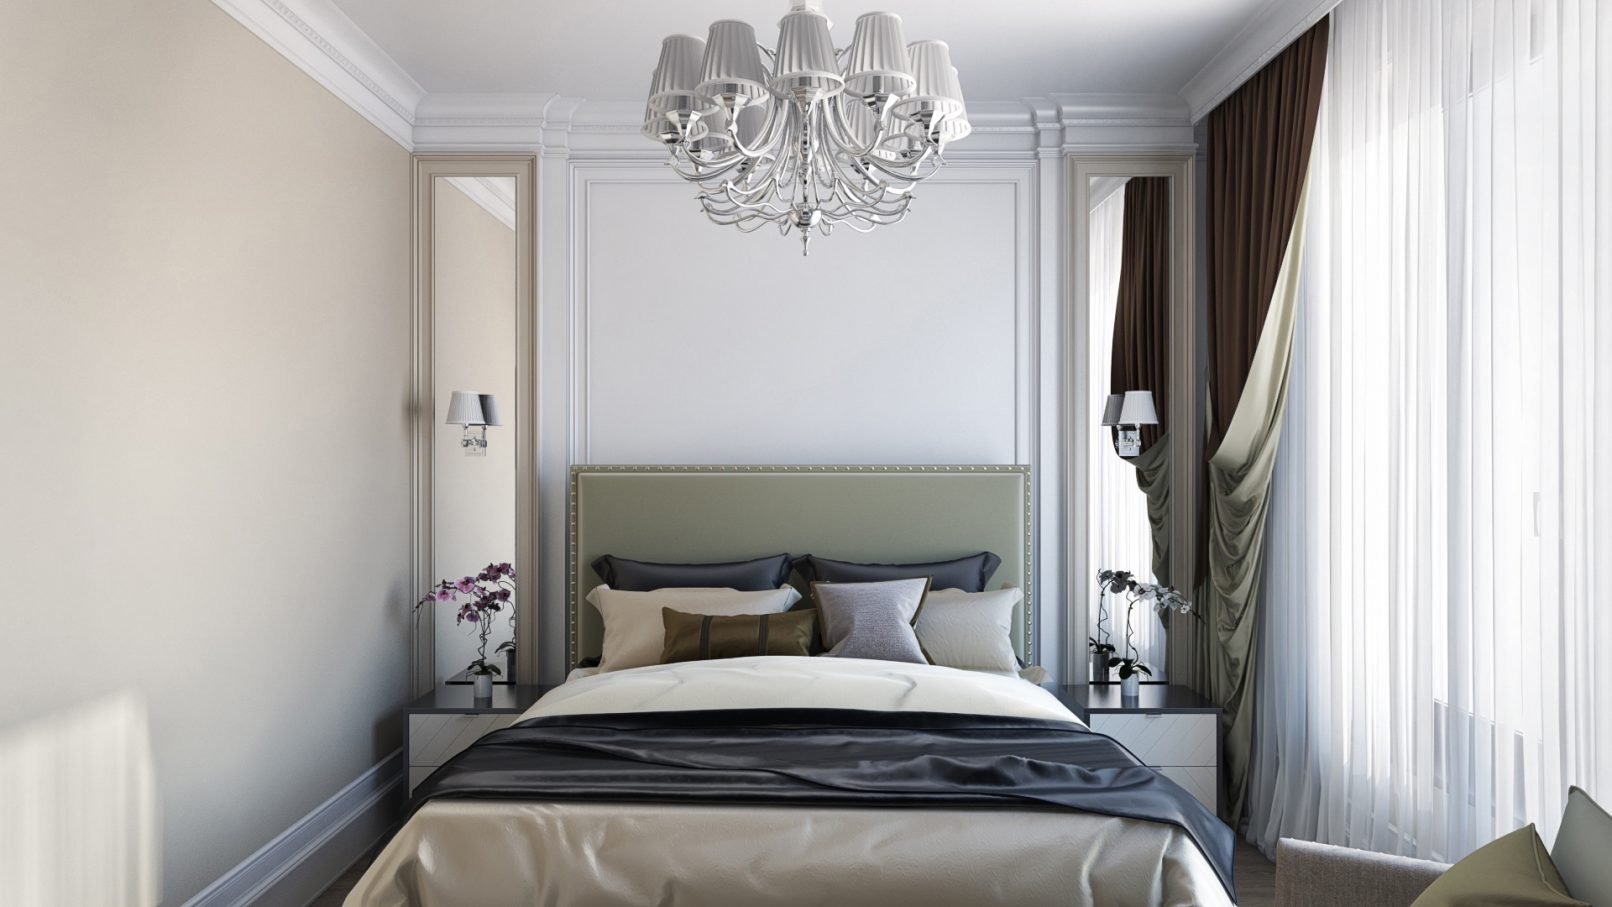 Уютная спальня 6 кв. м.